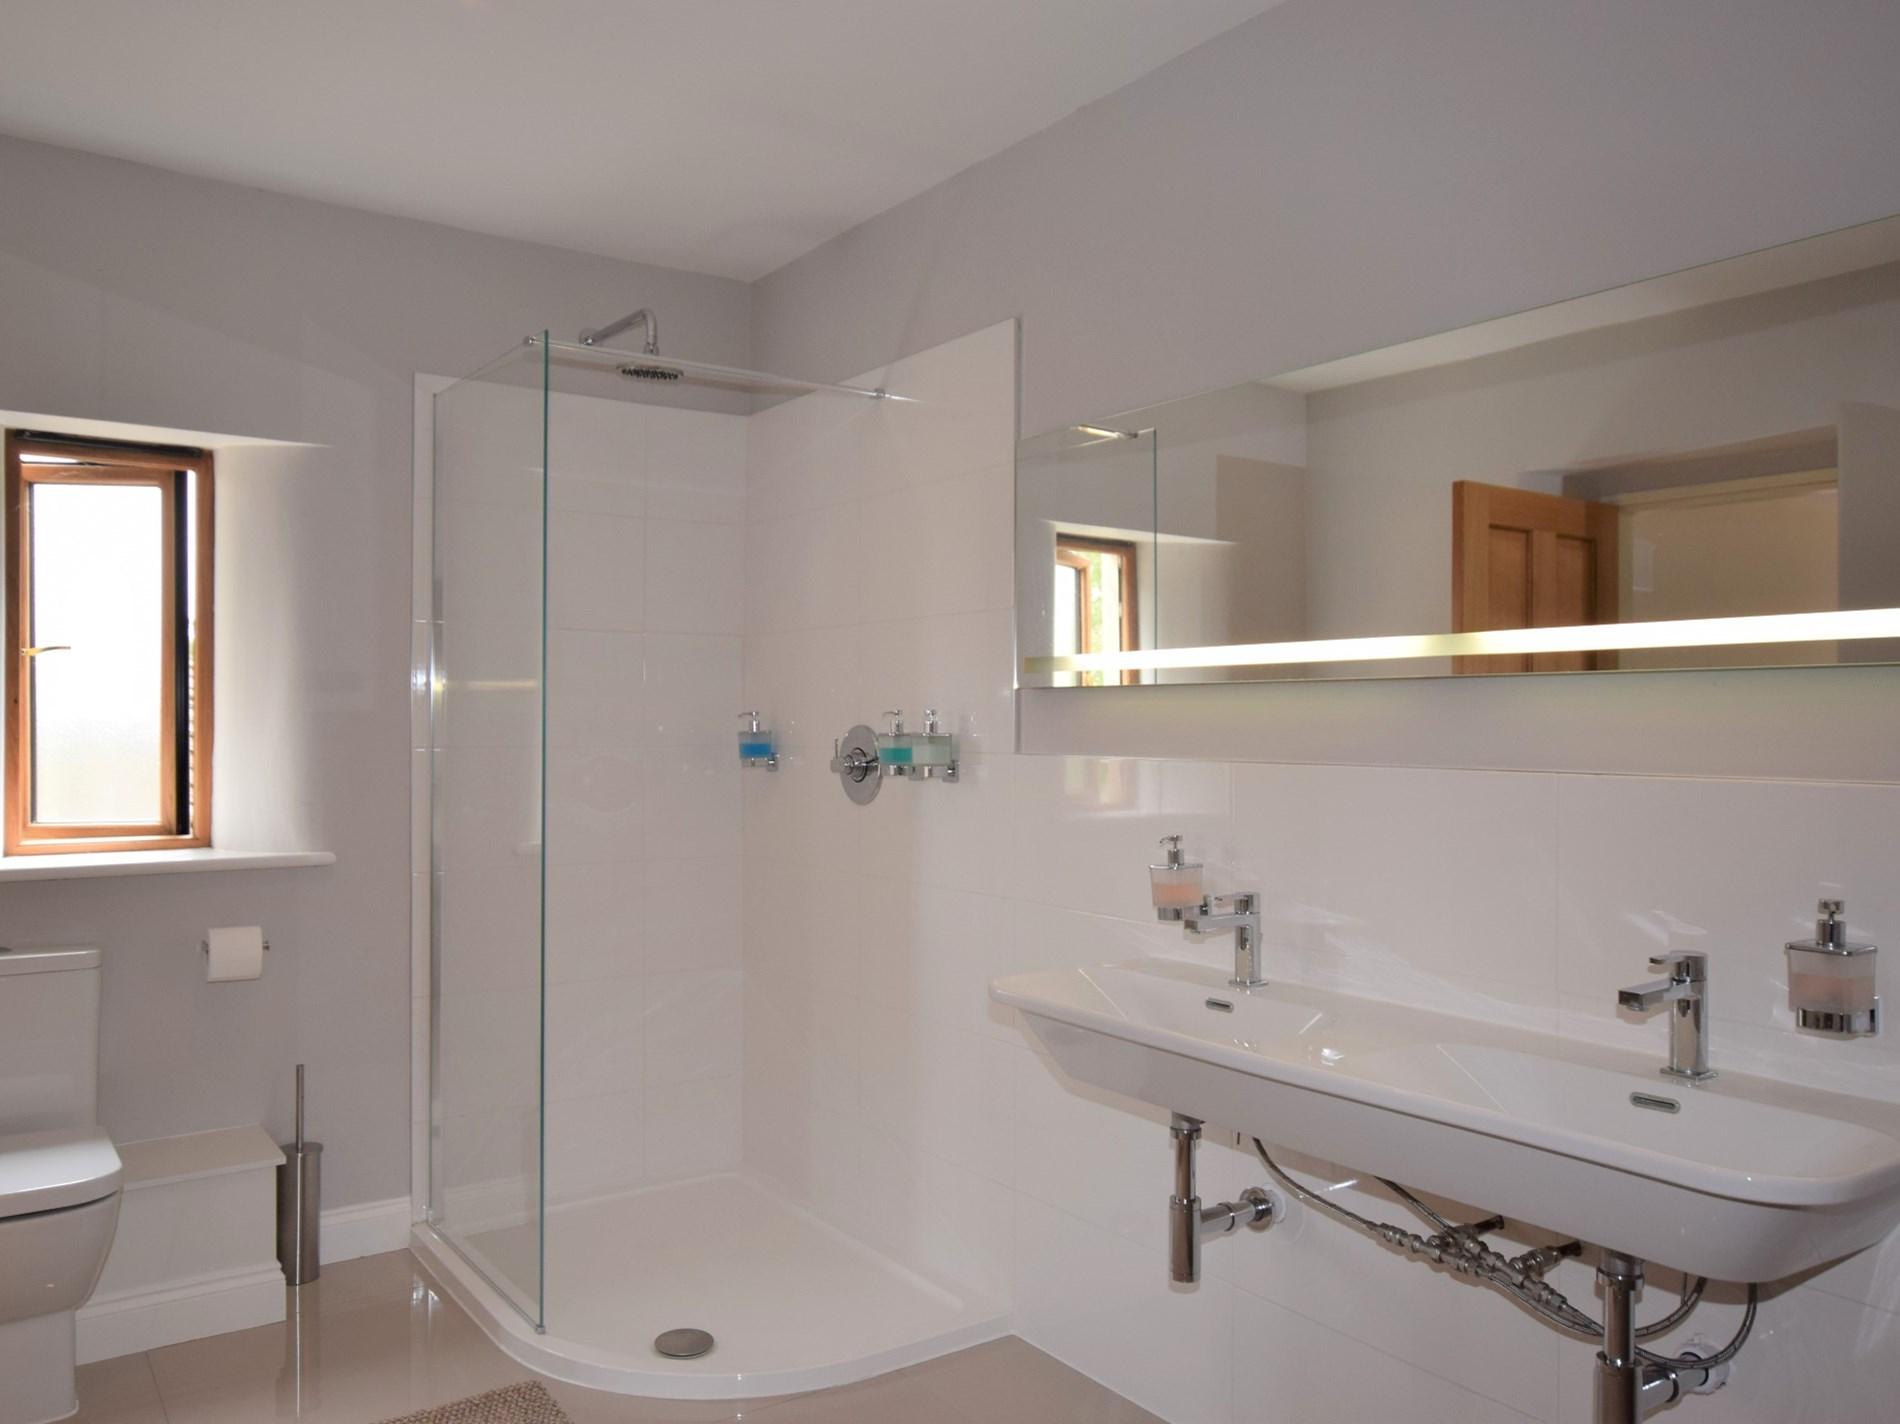 Master bedroom's en-suite with seperate shower